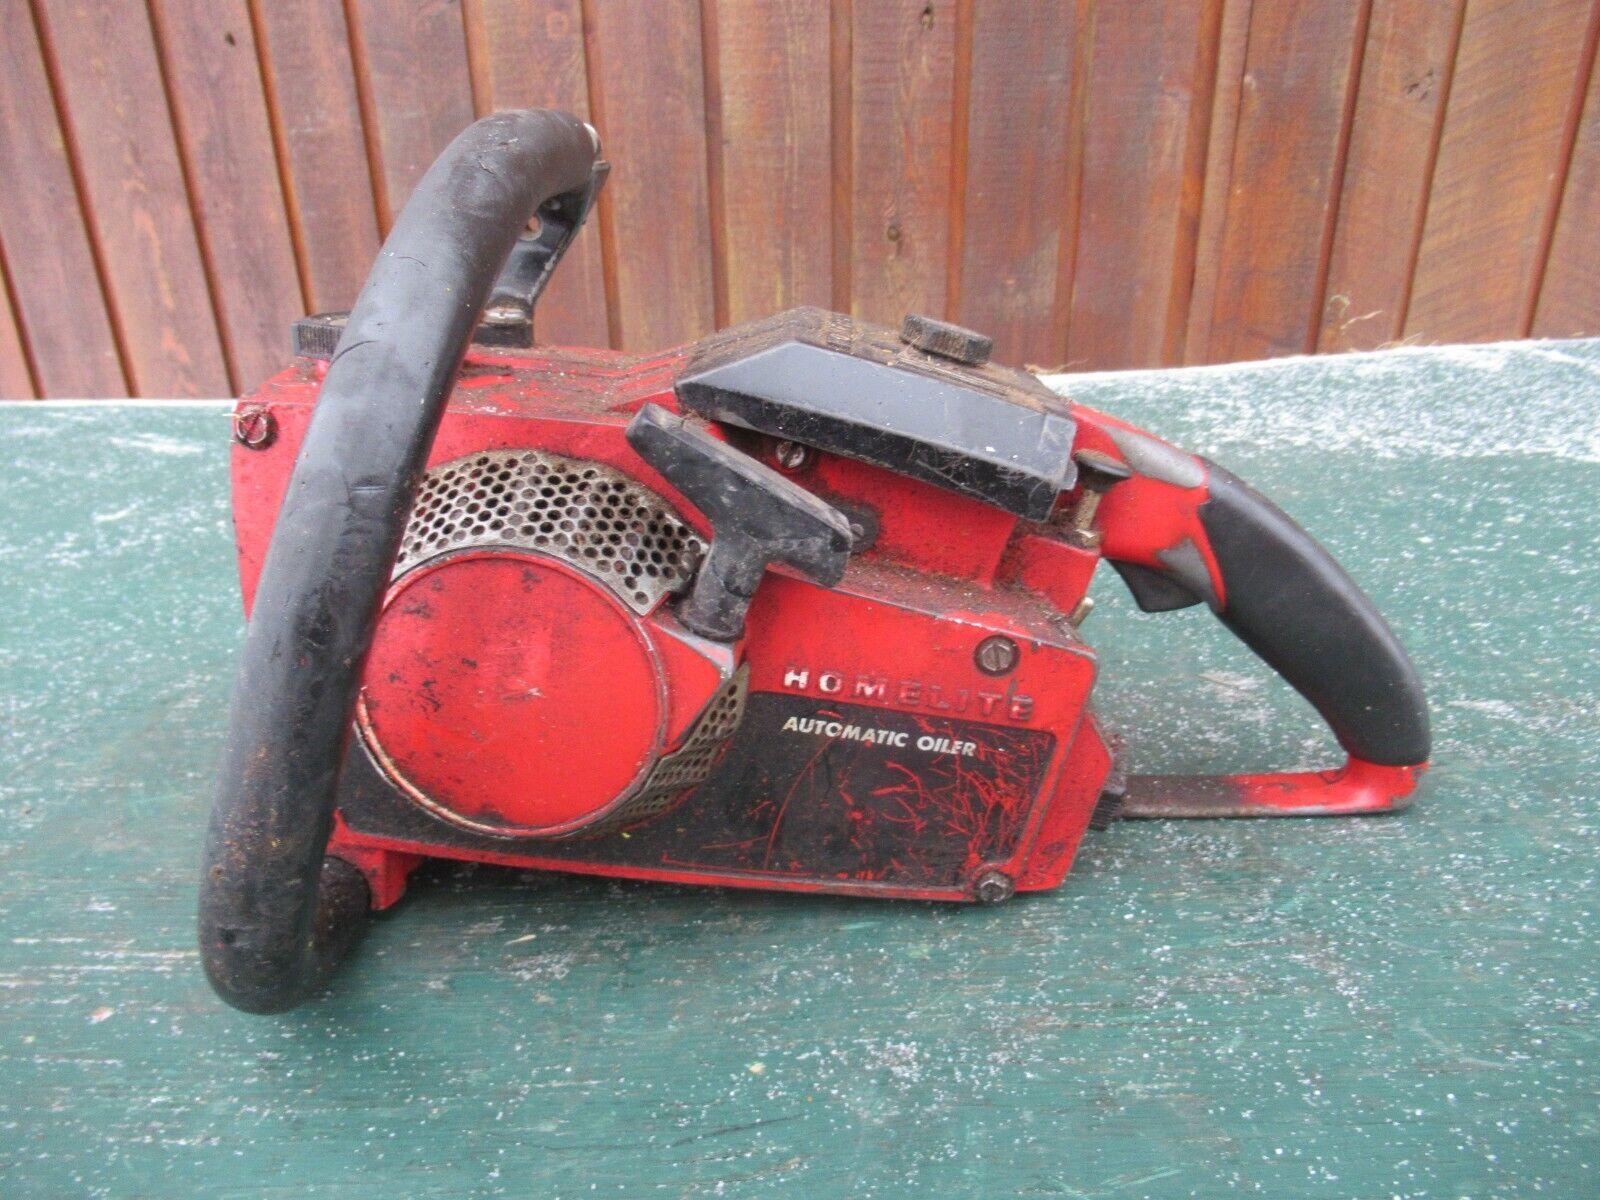 Vintage HOMELITE Chainsaw Chain Saw - $49.99